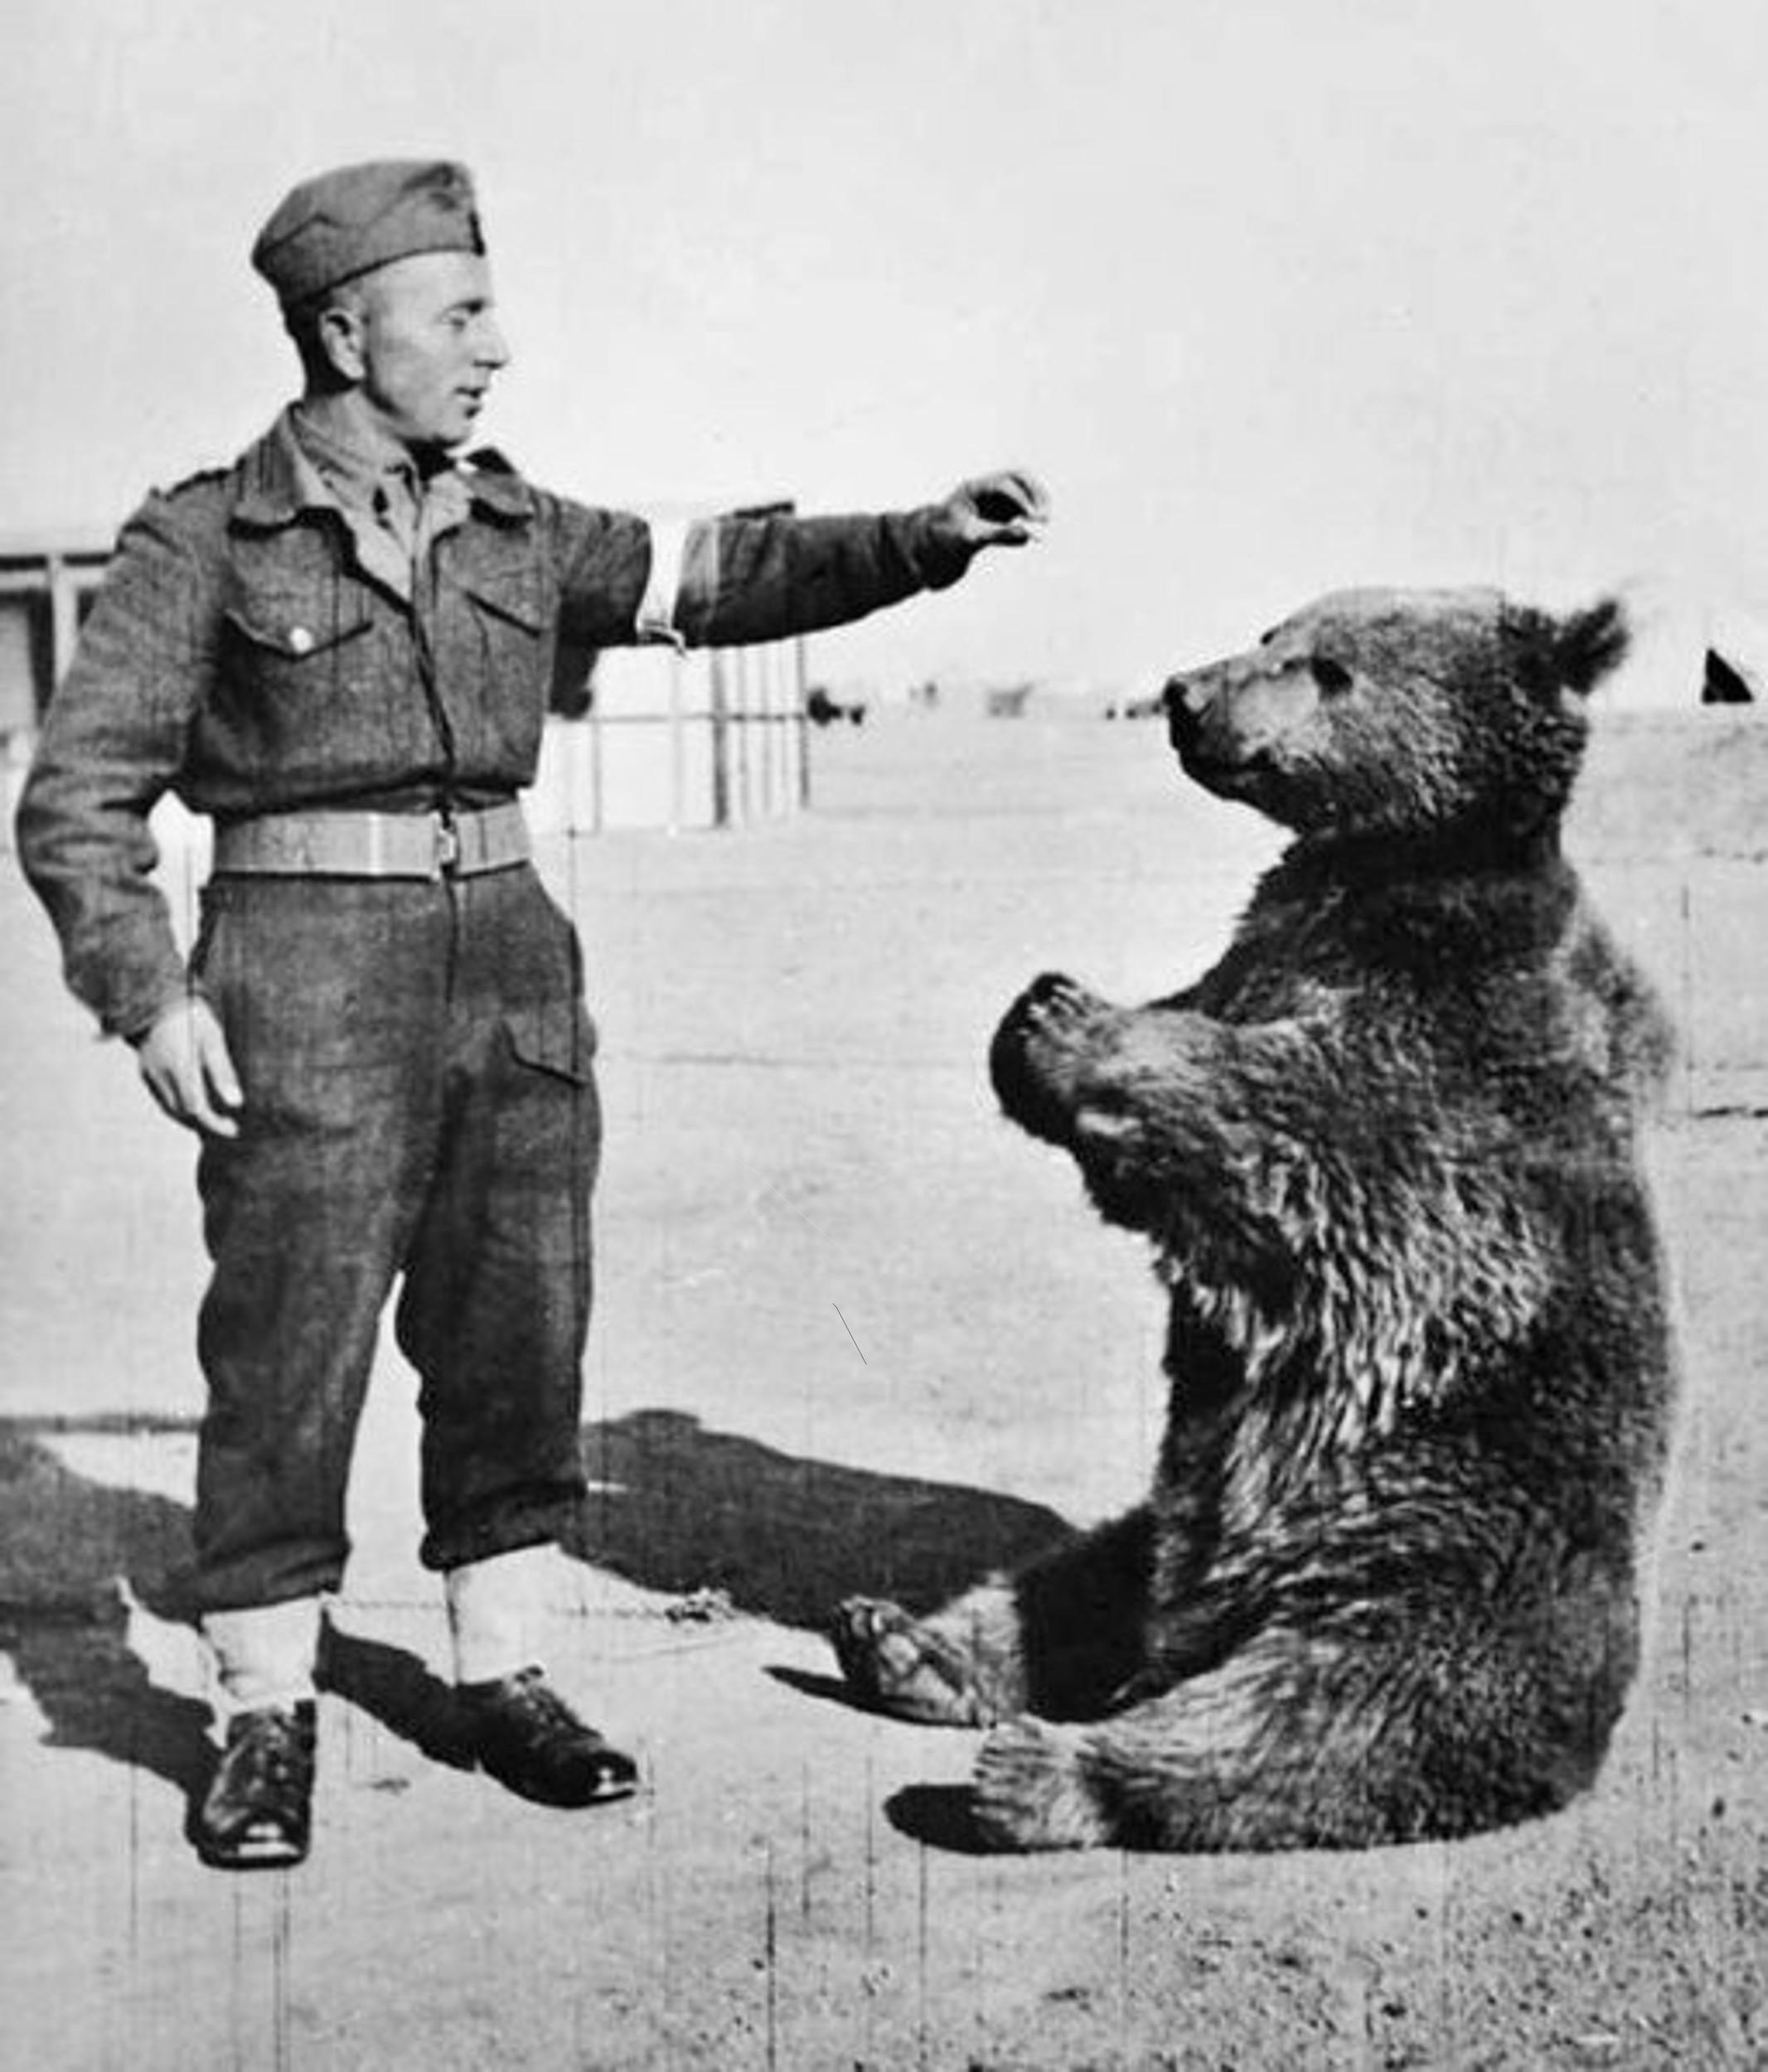 Wojtek the Bear taking food from a polish soldier